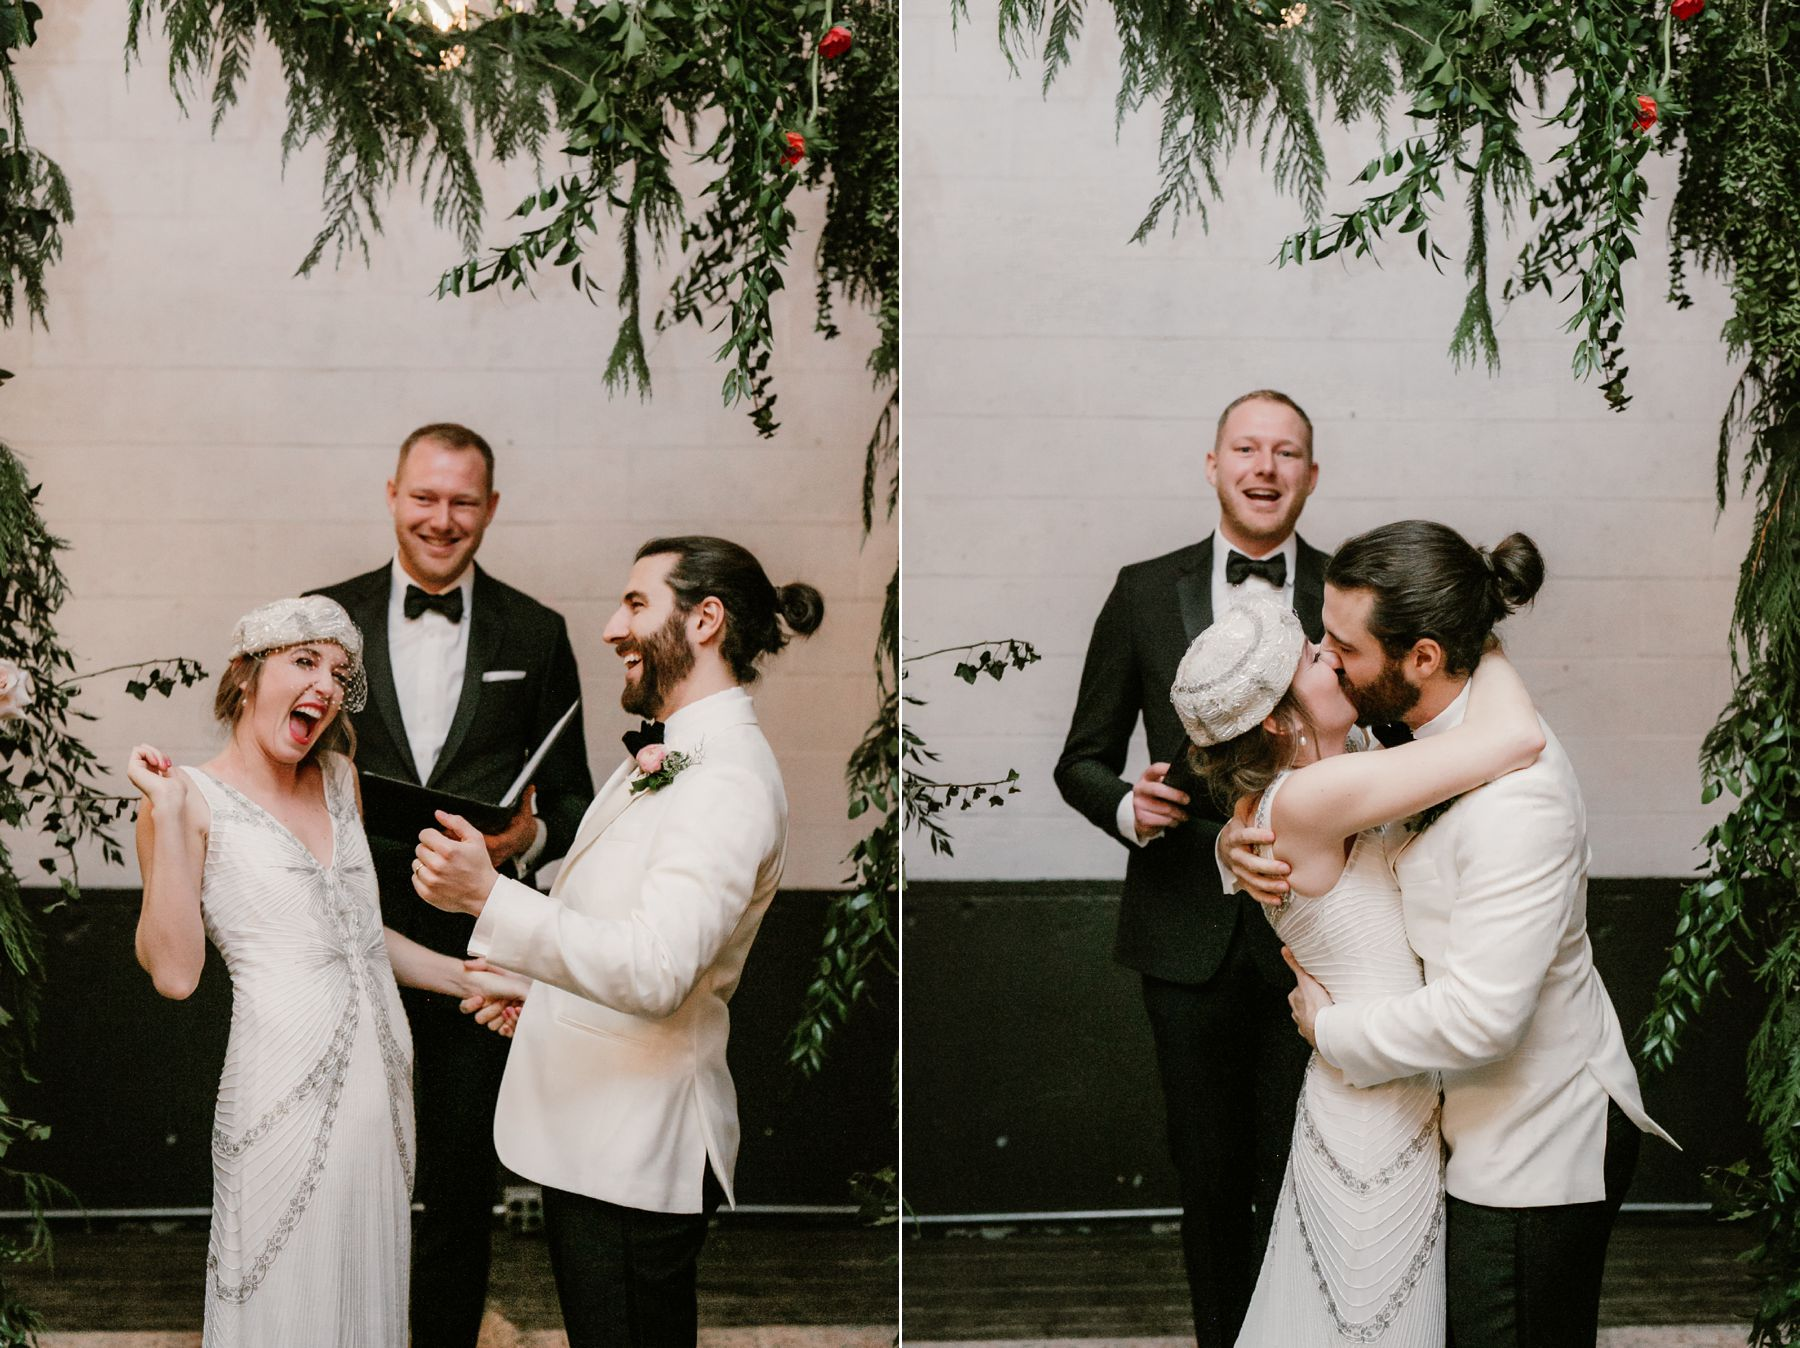 union-pine-wedding_0065.jpg